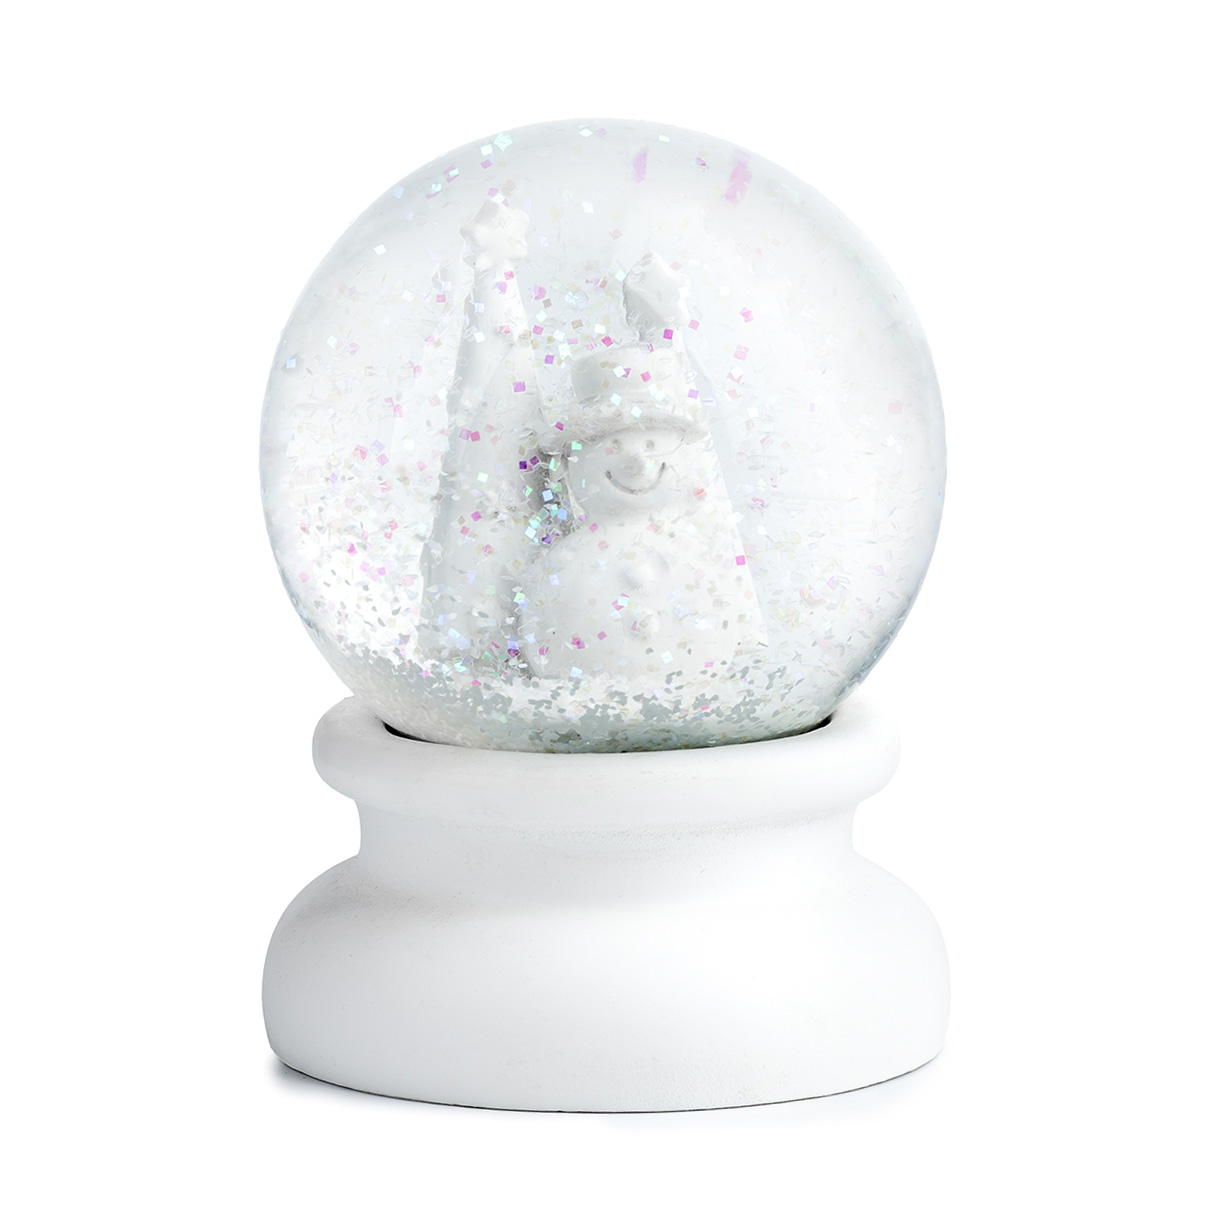 Sněžítko sklo/sádra 11cm bílá